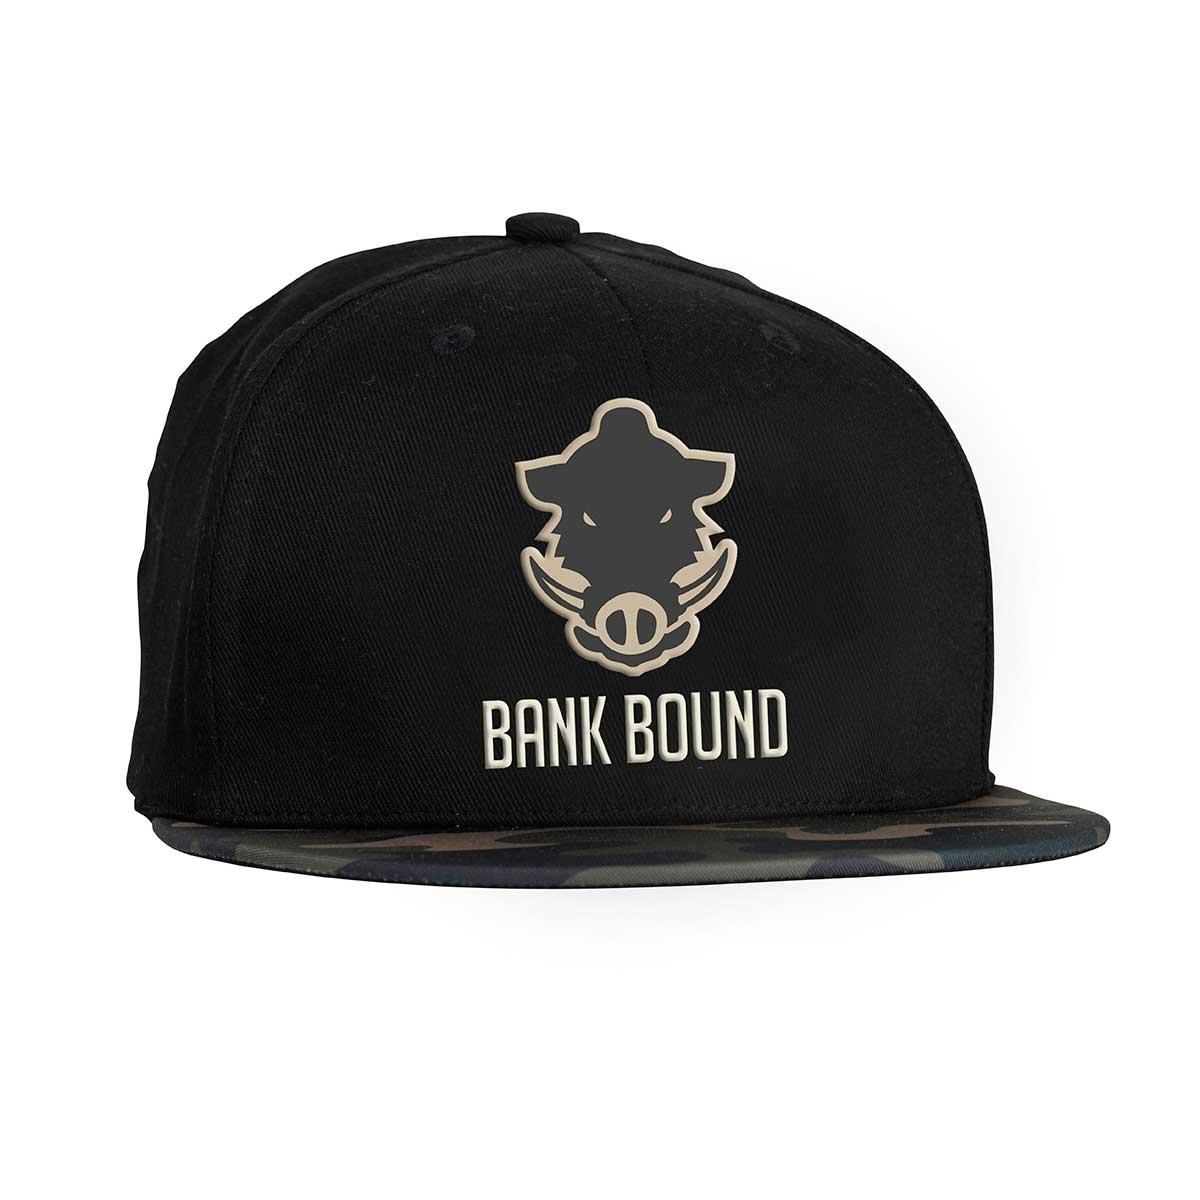 Prologic bank bound flat bill cap black camo glasgow for Flat bill fishing hats